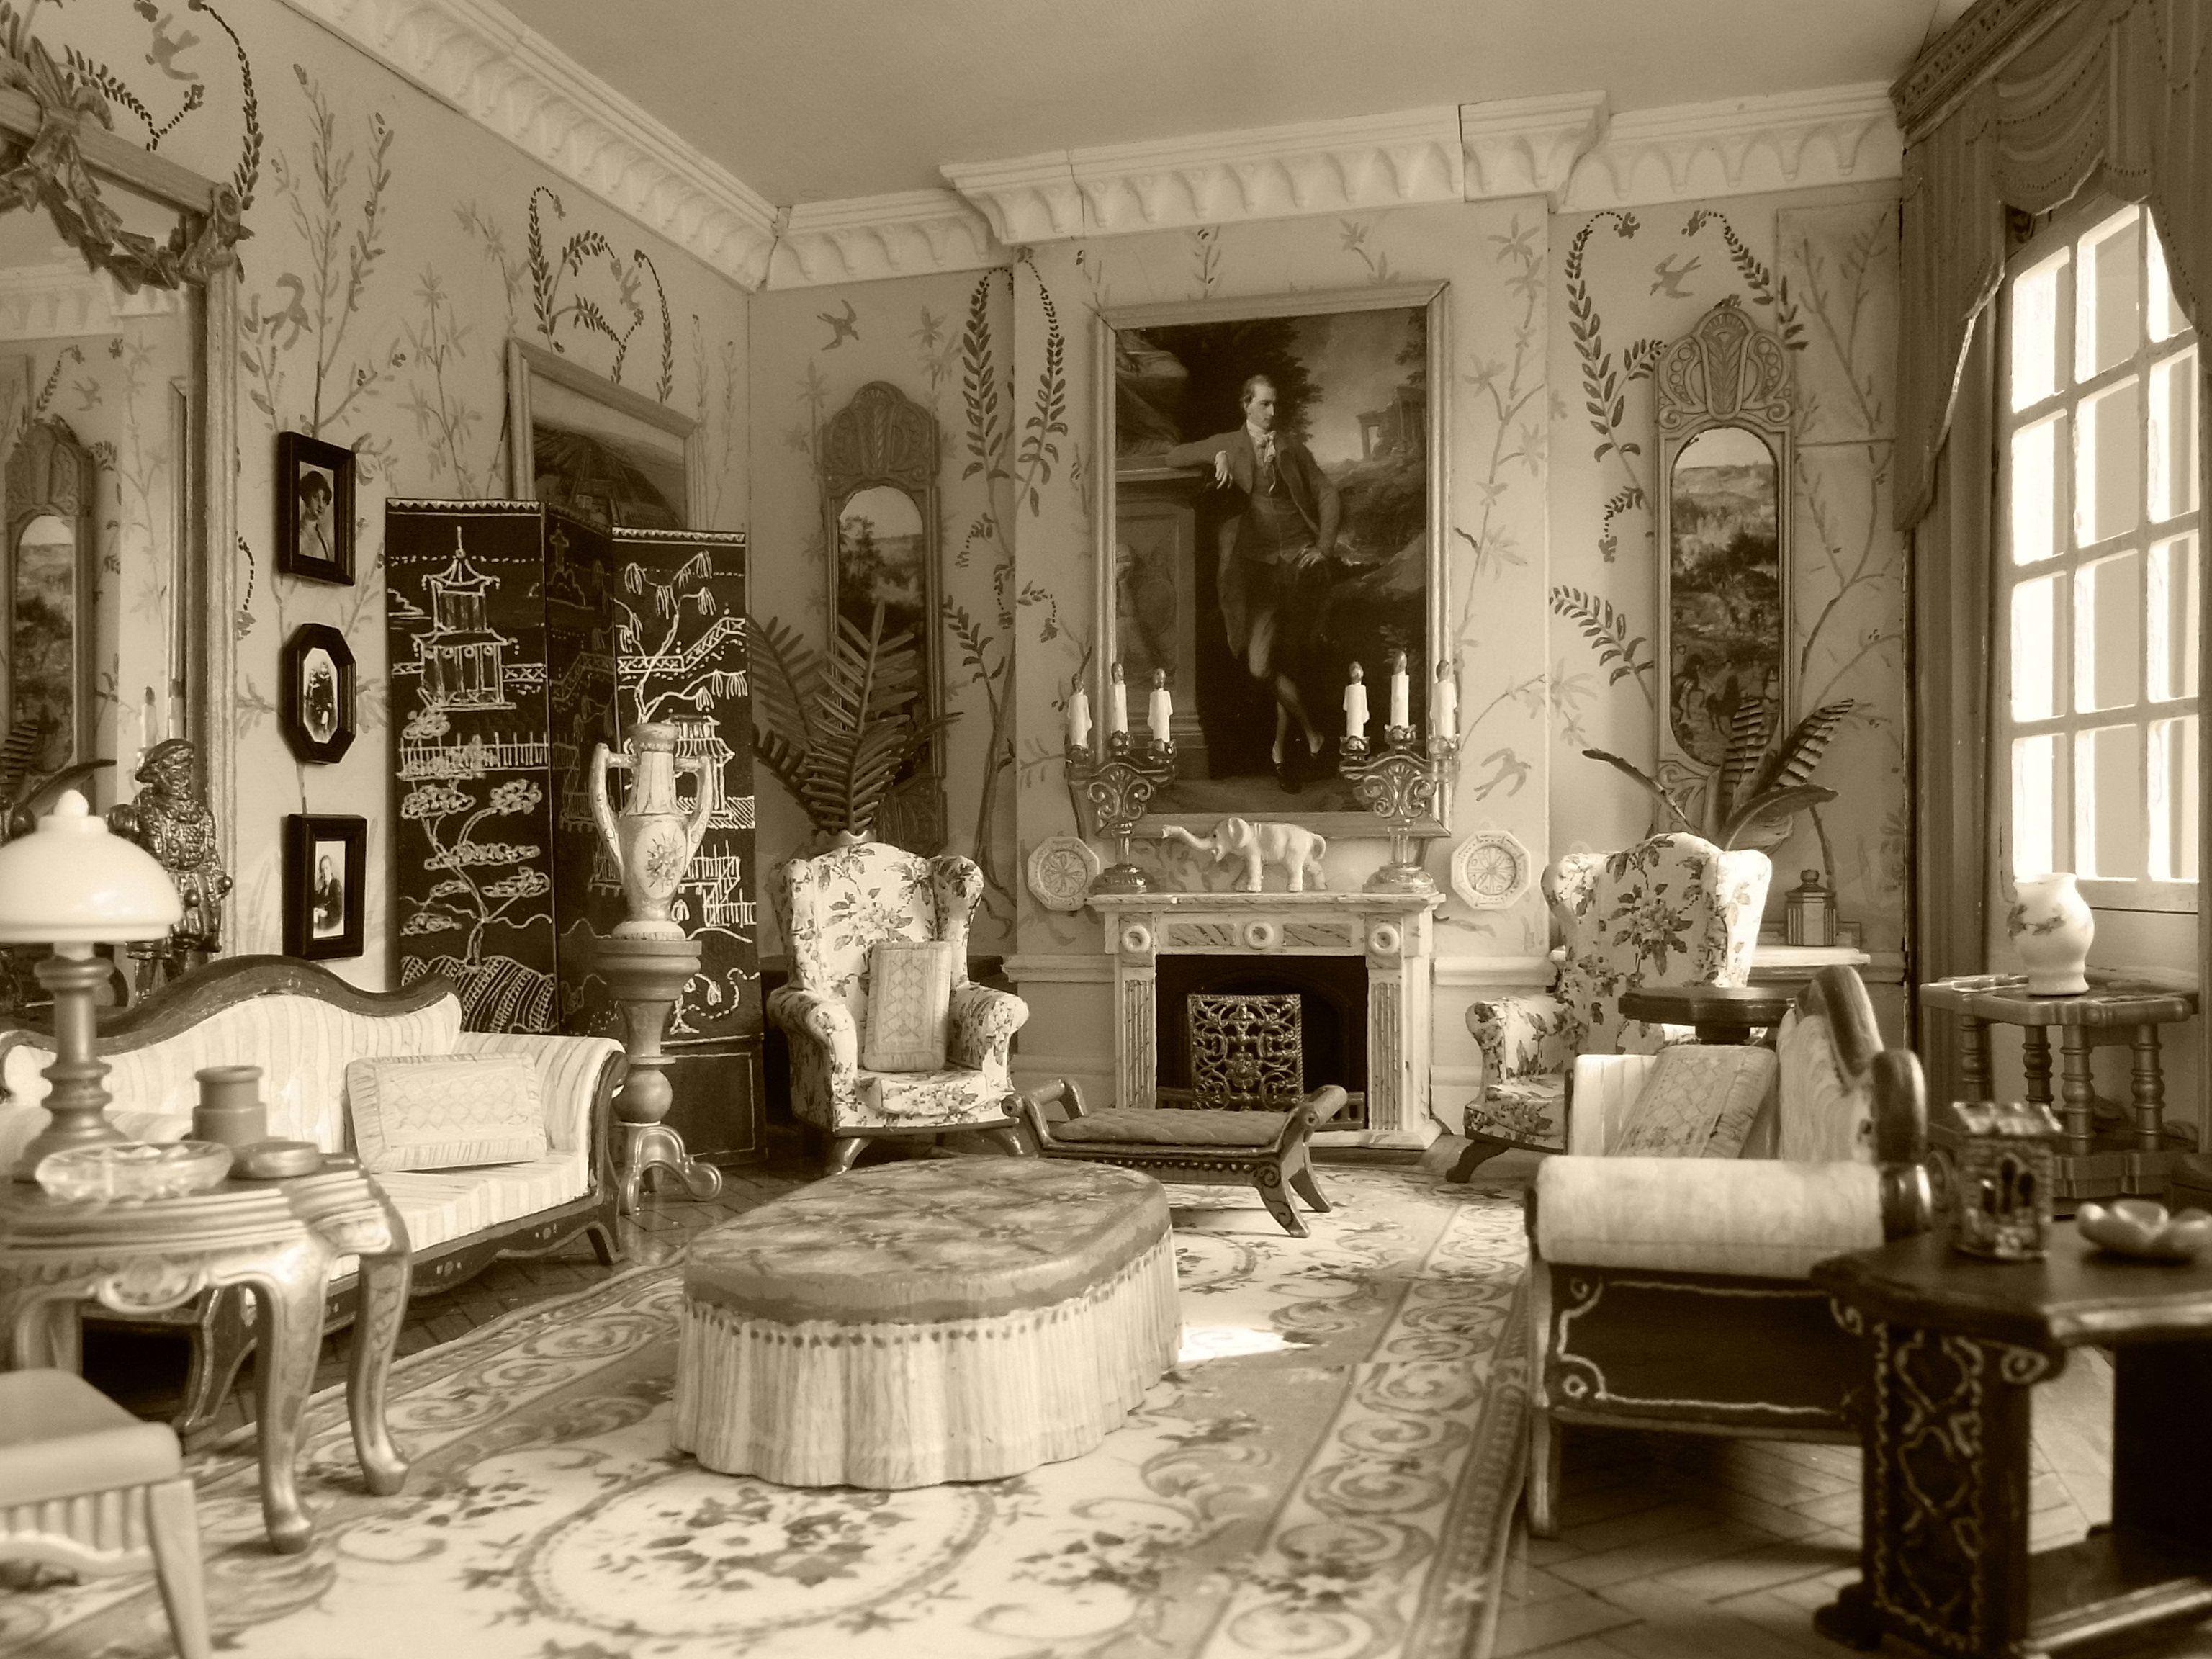 Images for victorian era bedroom